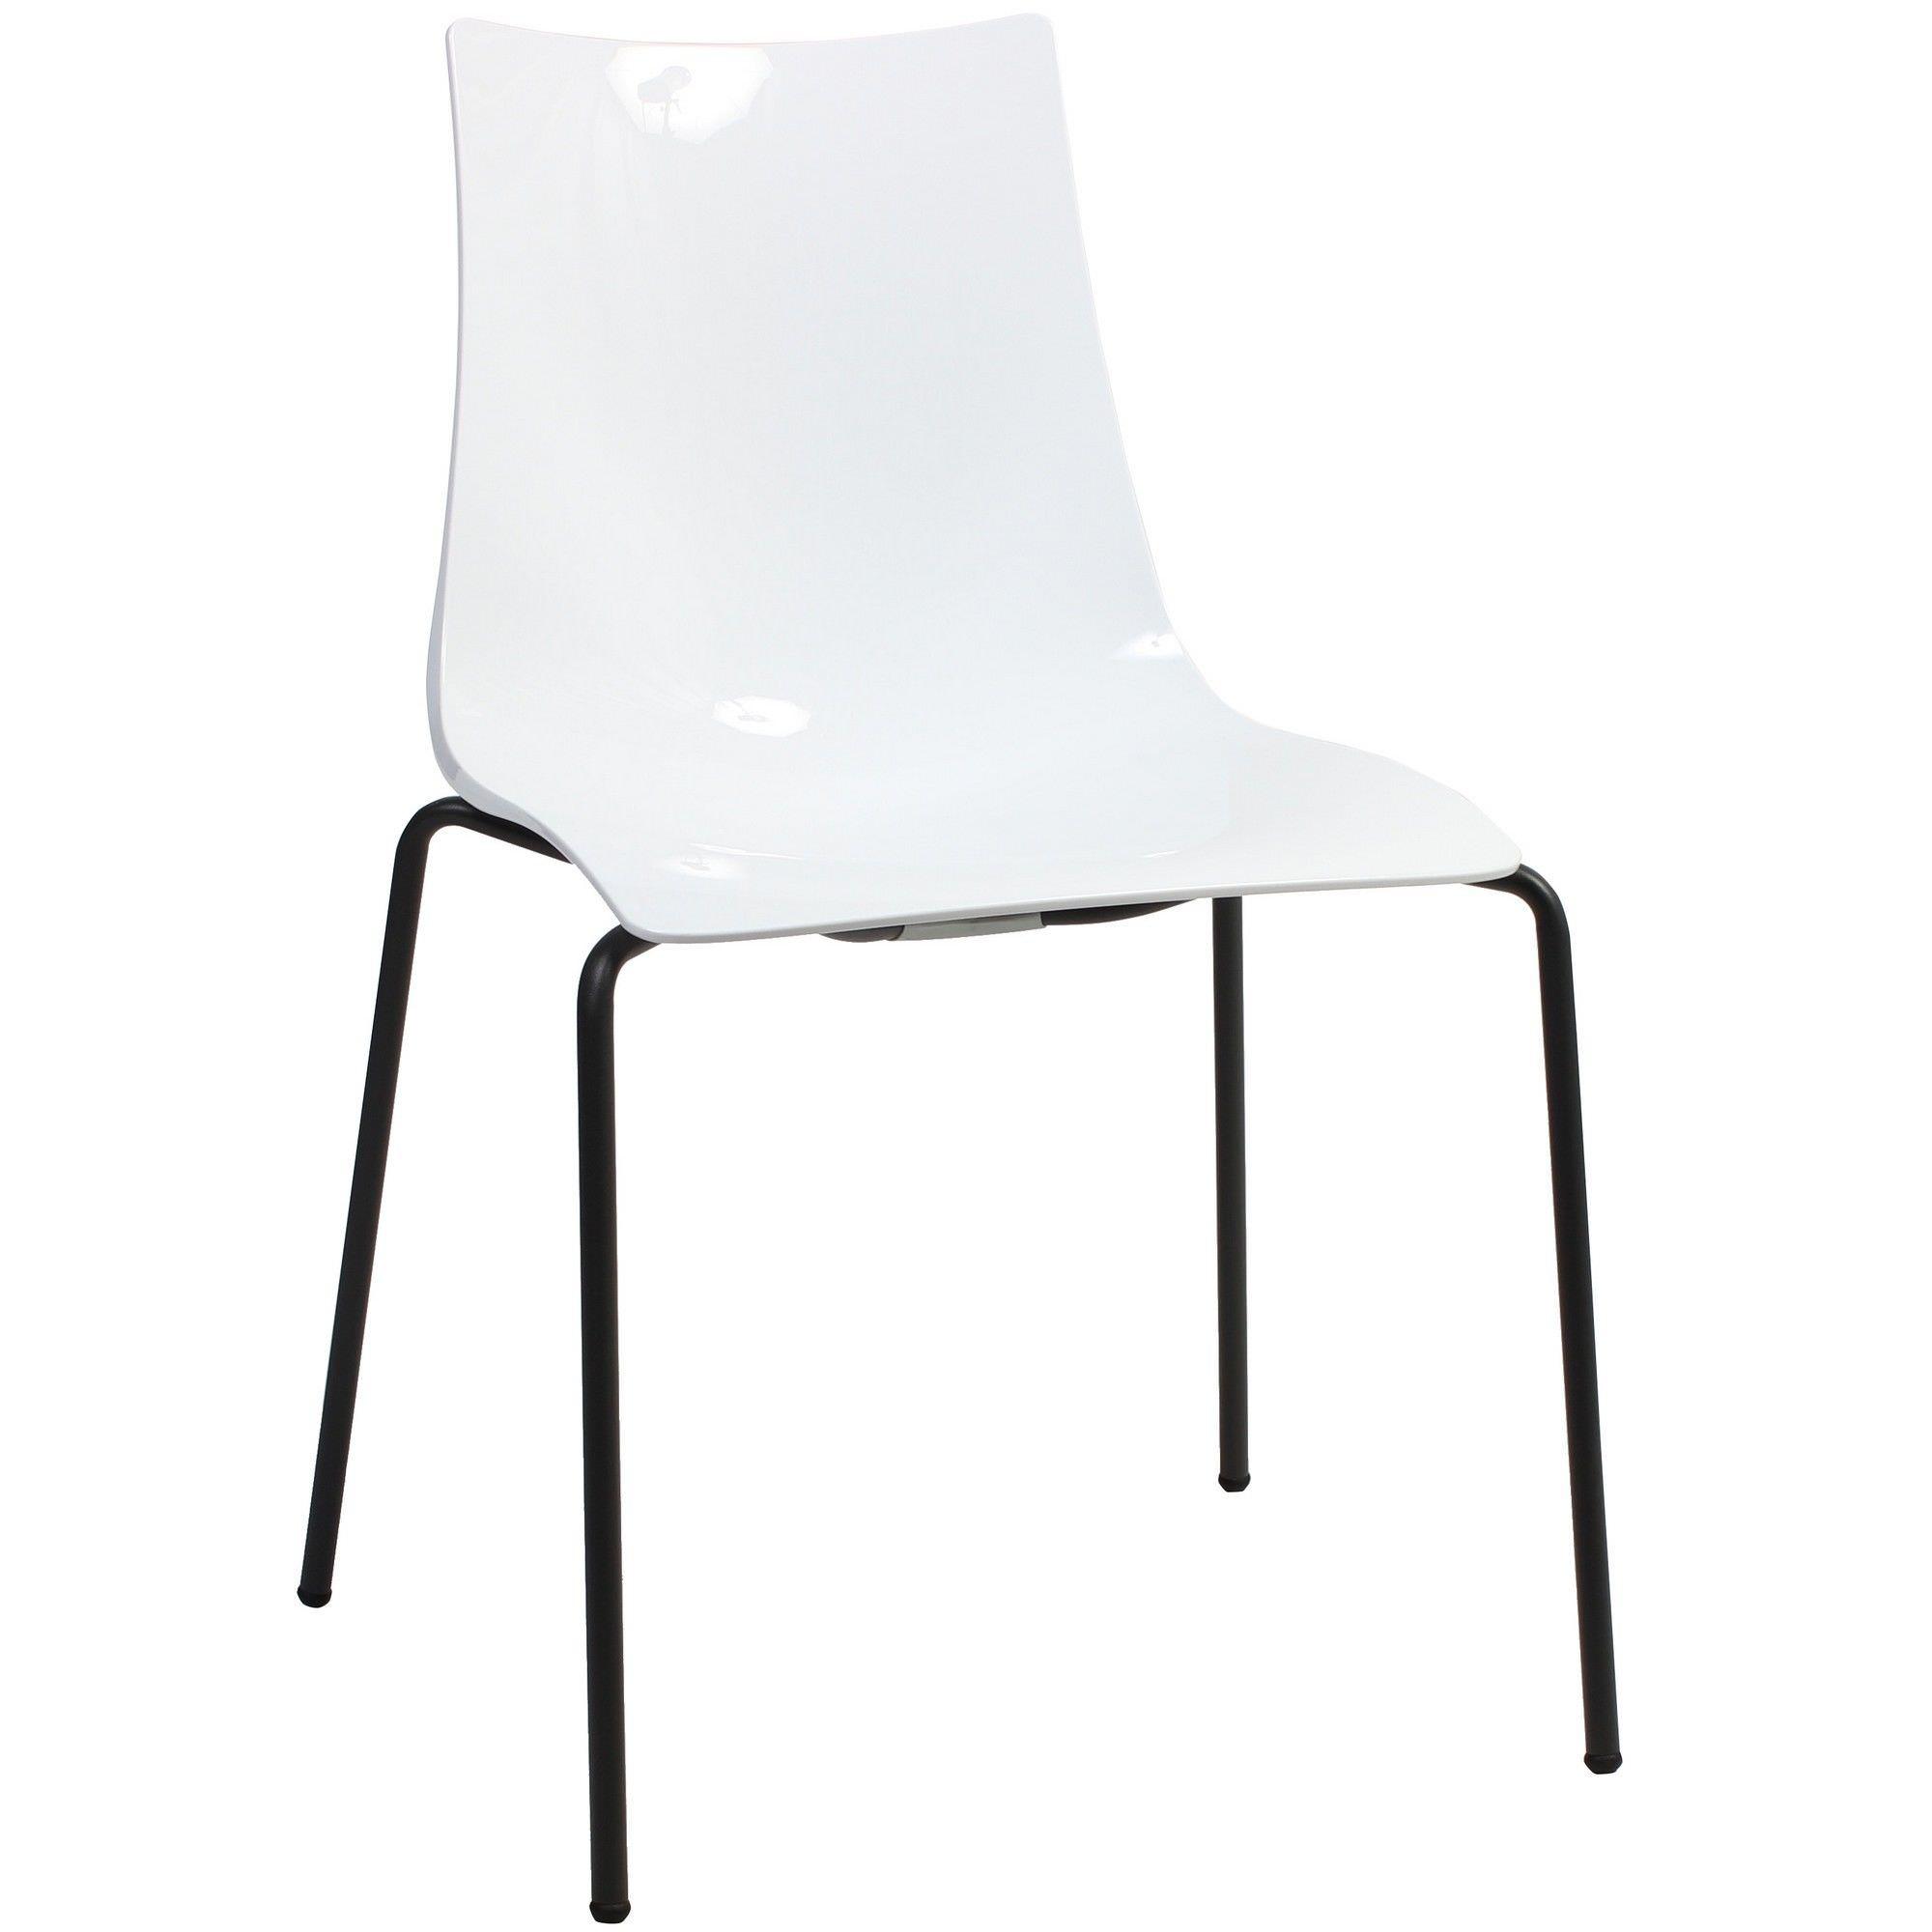 Zebra Italian Made Commercial Grade Dining Chair, Metal Leg, White / Anthracite